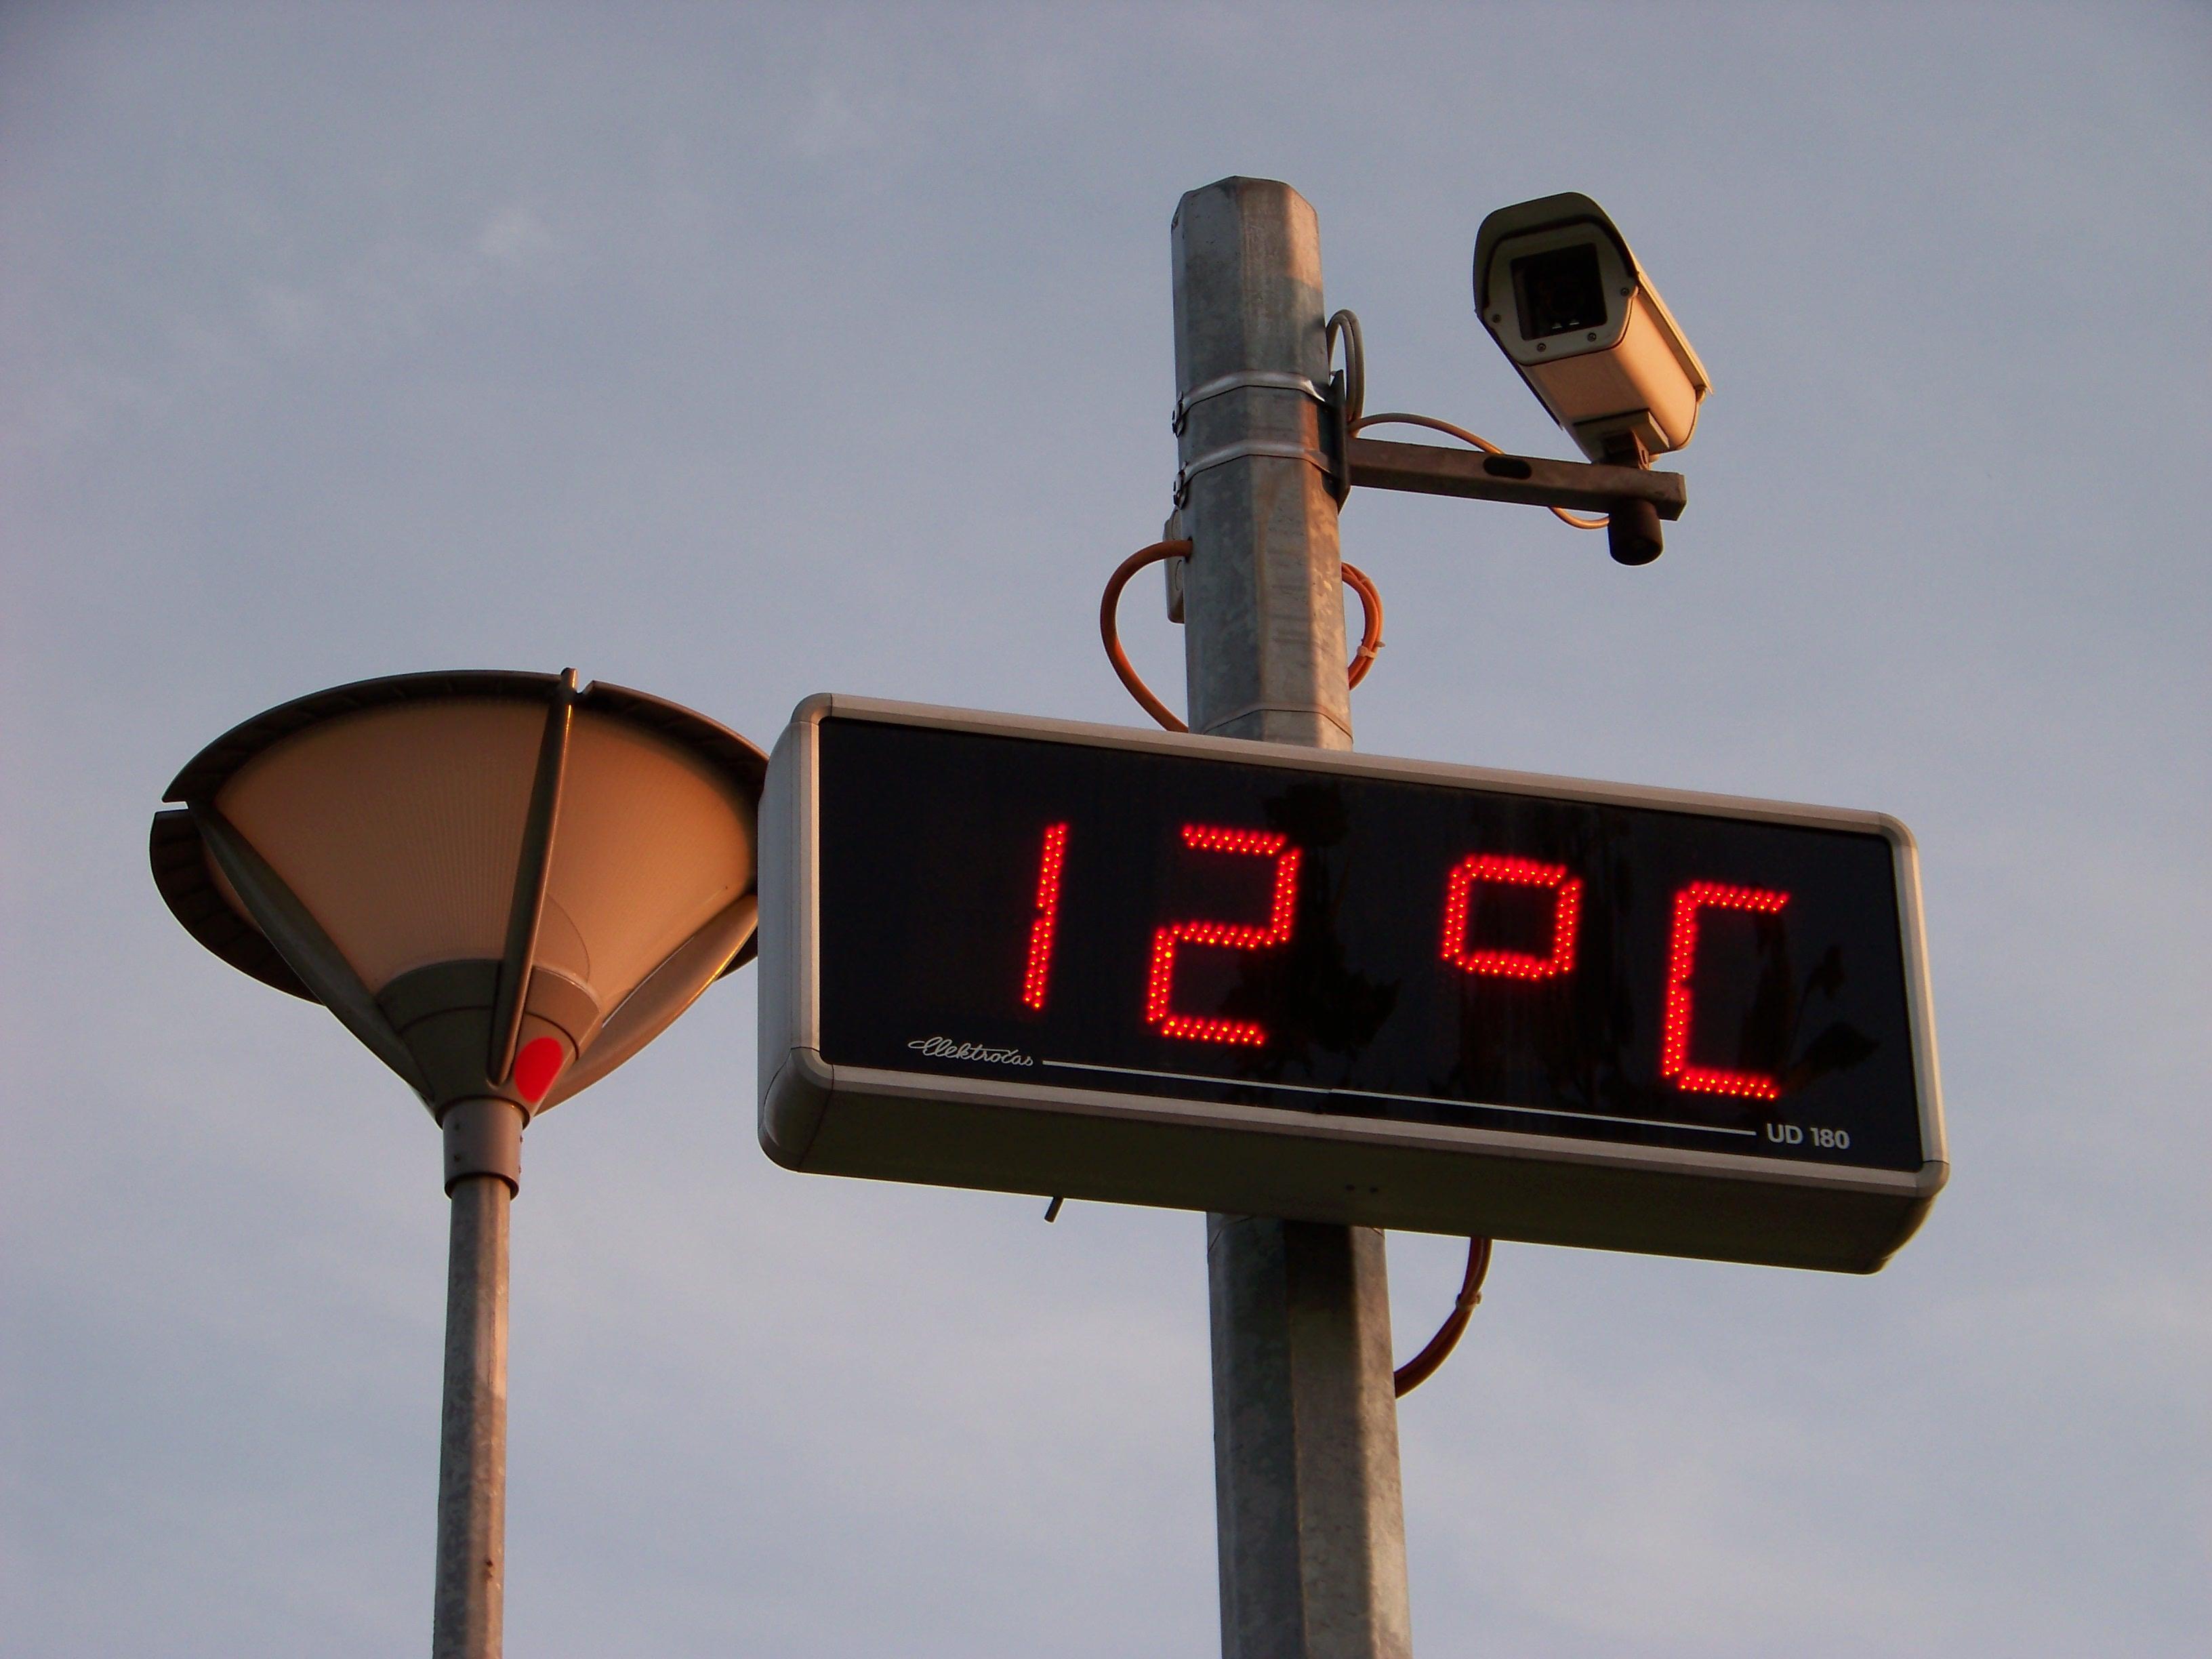 ファイル:Prosek, displej času a teploty a kamera, teplota.jpg